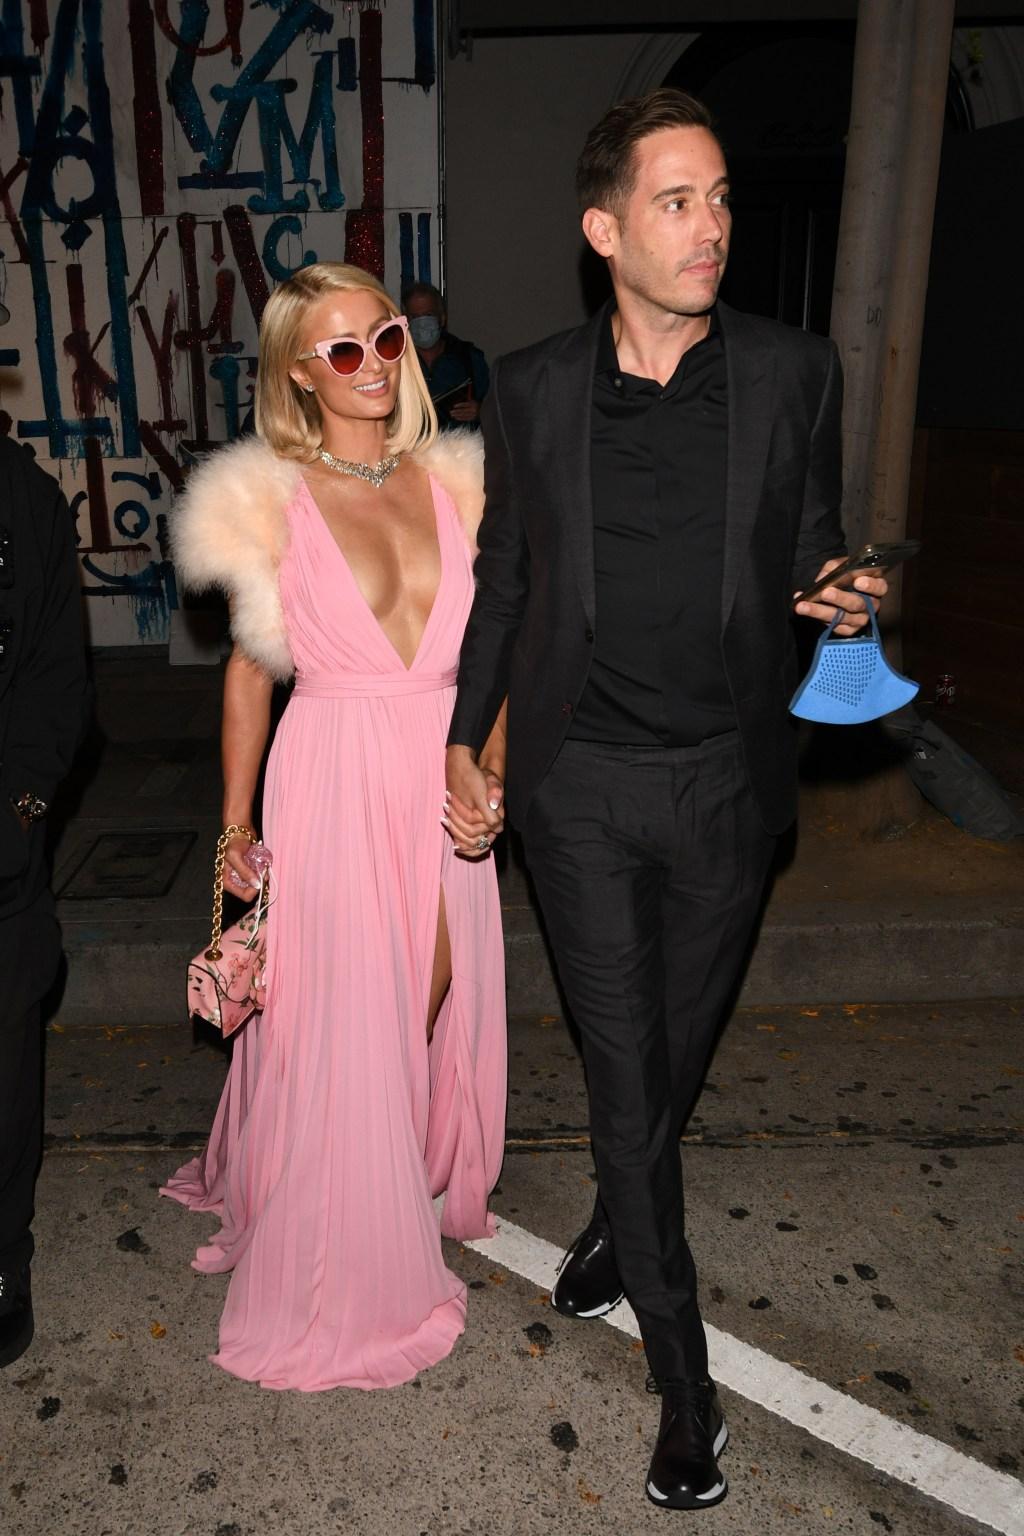 Paris Hilton and Carter Reum